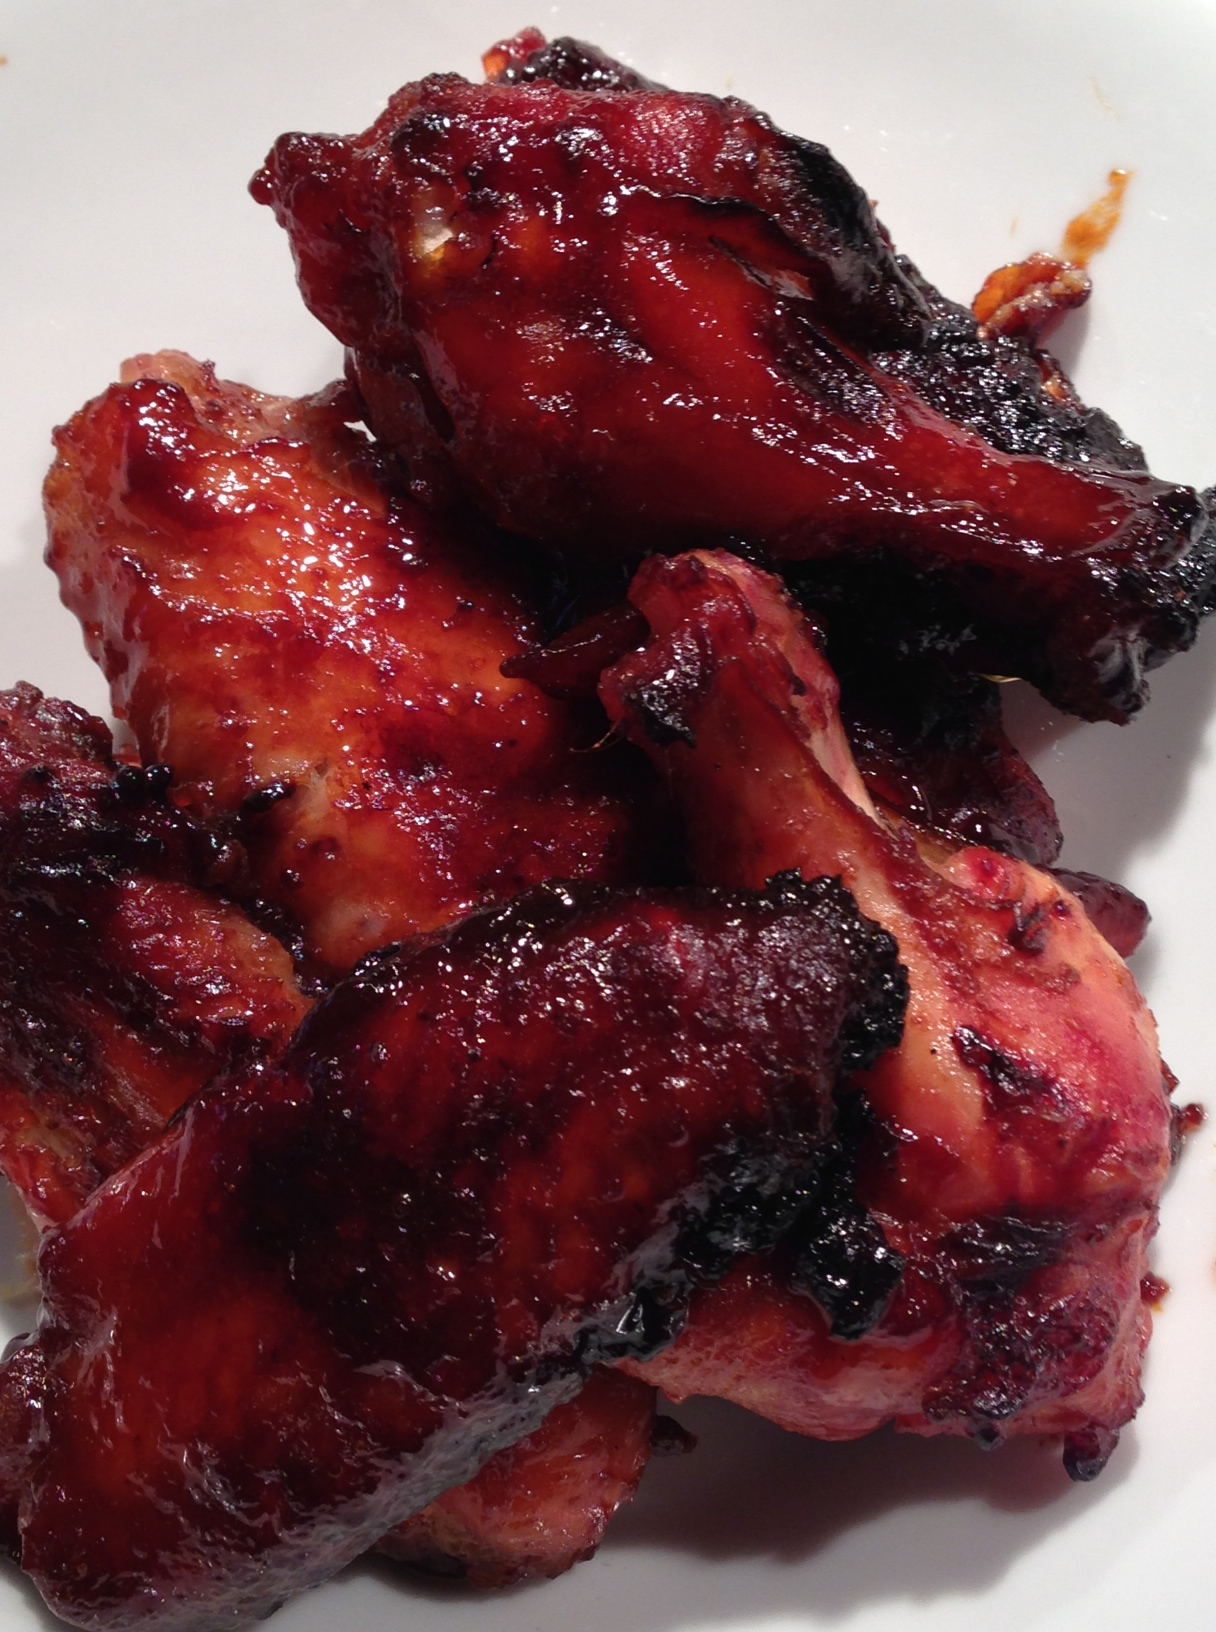 4lbs Buffalo Style Chicken Wings 3t Hoisin Sauce C Sesame Oil 2t Garlic Powder 2t Brown Sugar 2t Raw Honey C Sweet Vermouth C Light Soy Sauce